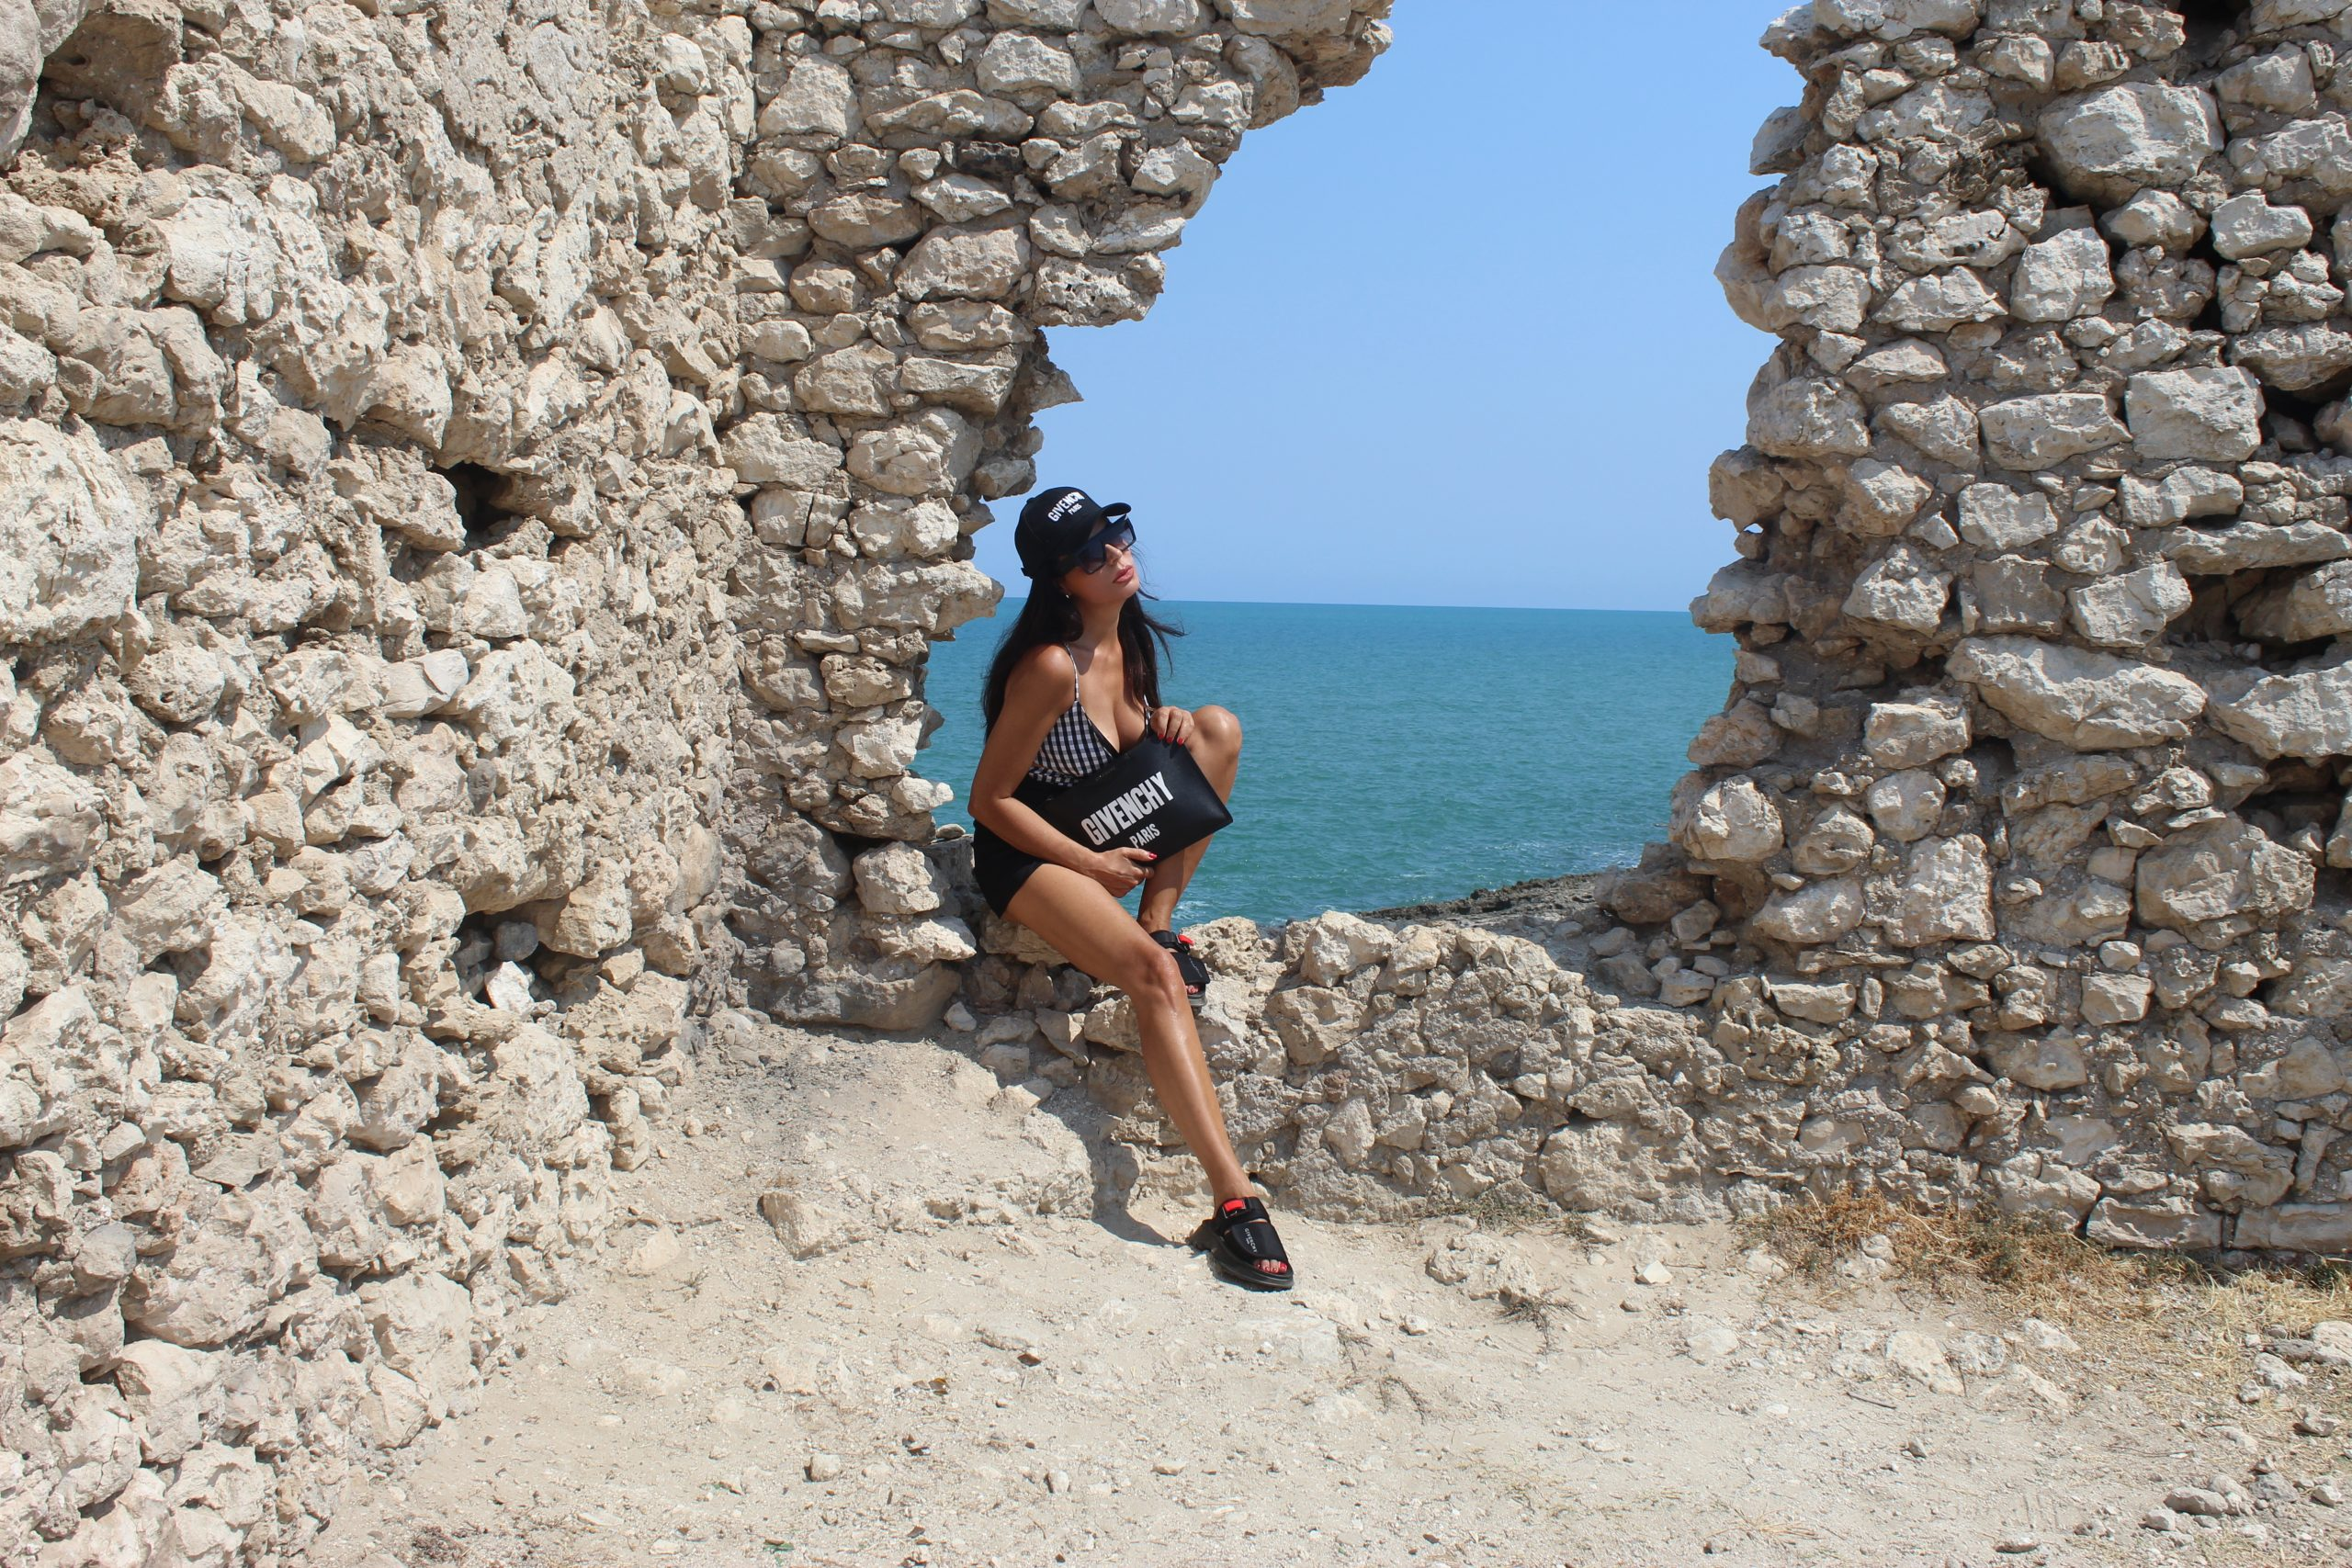 Elisabetta Franchi Givenchy Puglia Lookbook Travel Blogging Summer Summertime Beachwear Paola Lauretano